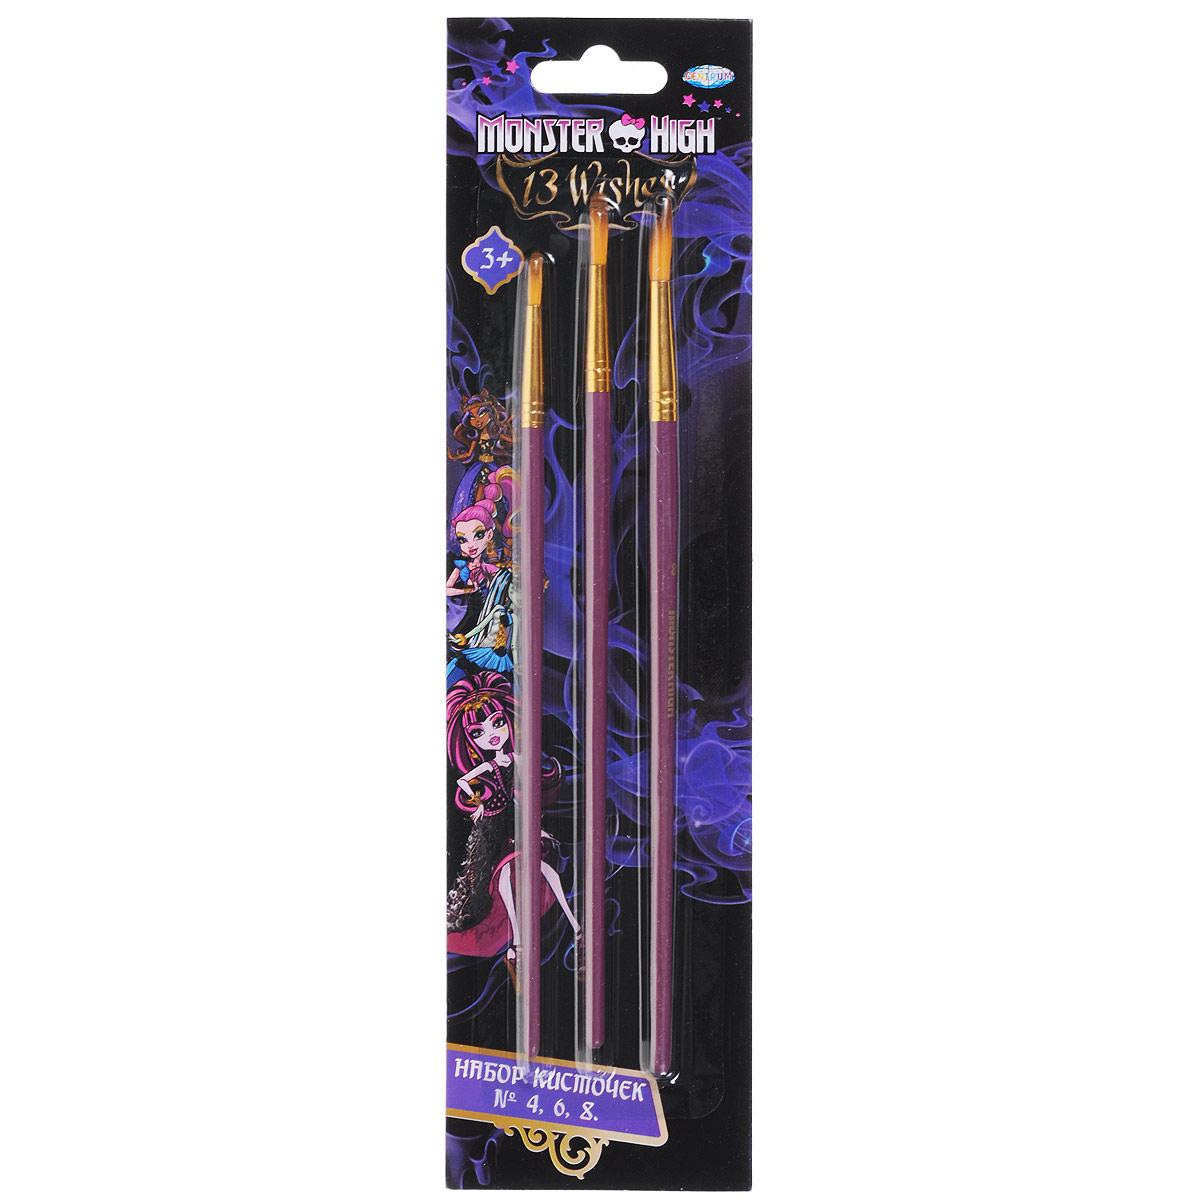 Monster High Набор круглых кистей №4, 6, 8 (3 шт)